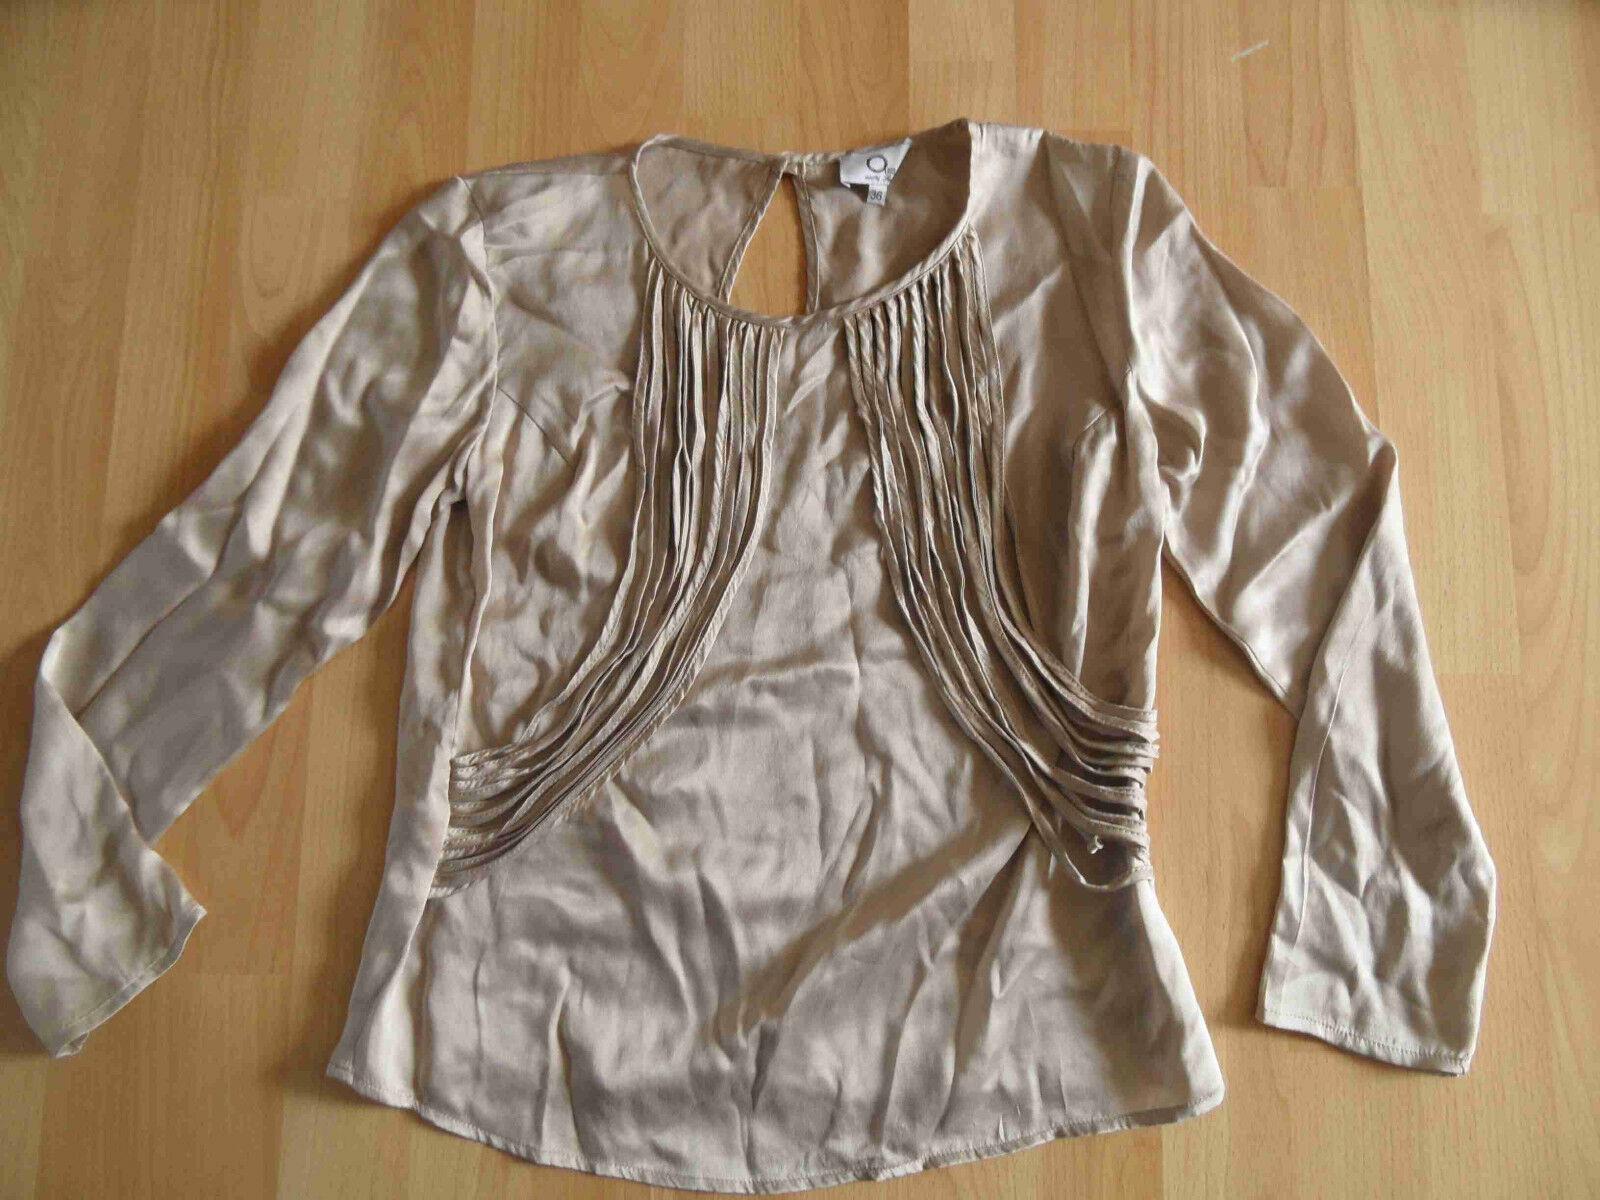 ZOE ONA Designer Blausenshirt Seide taupe Gr. 36 NEUw.  OA1